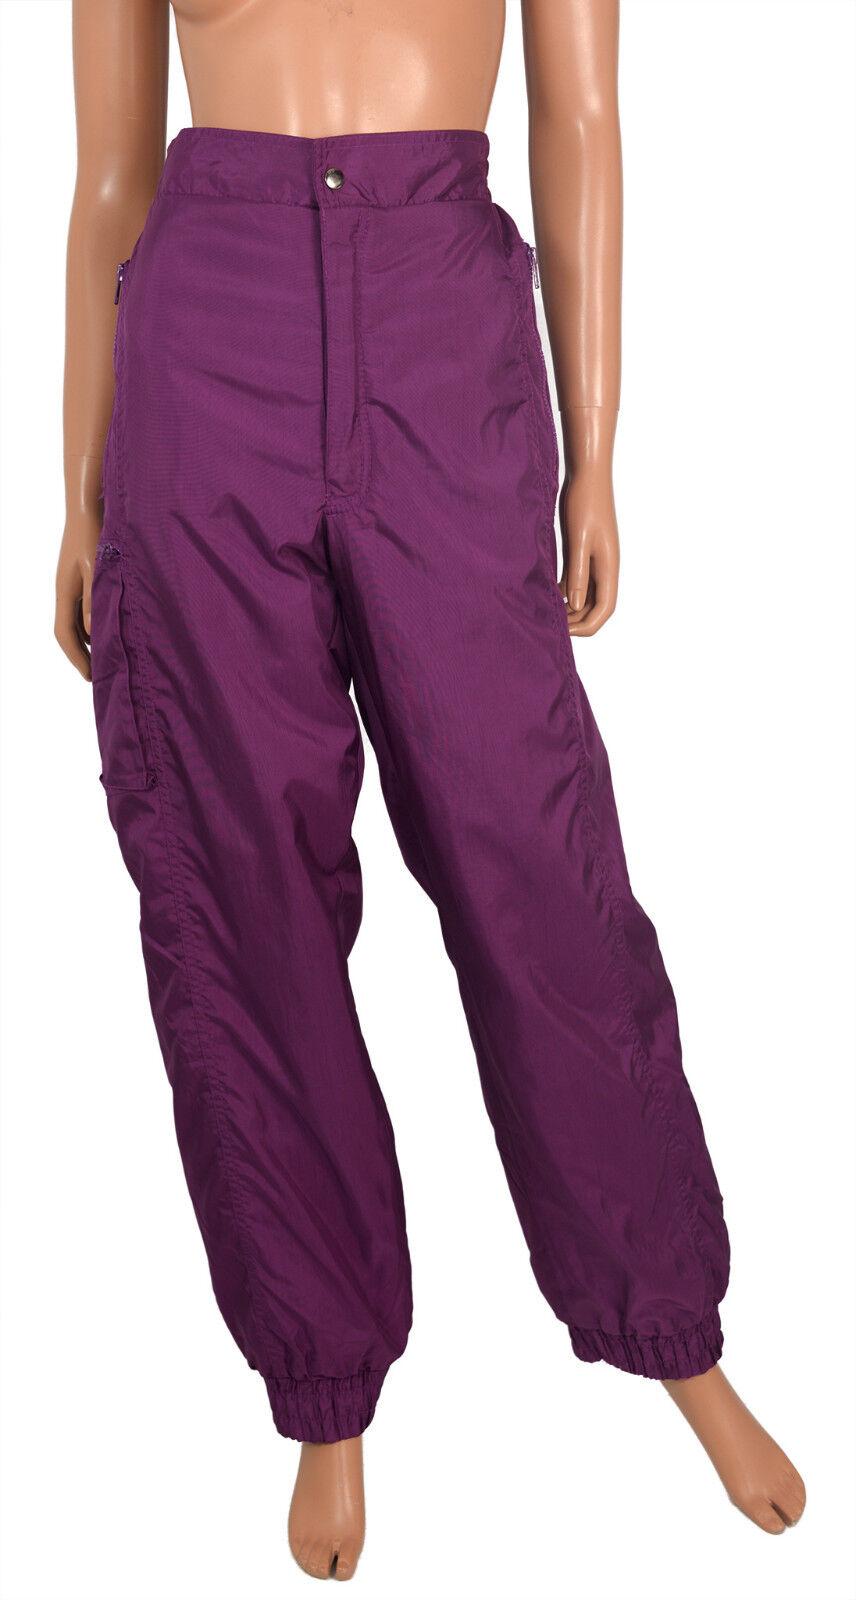 Downhill Racer SKI PANTS Purple Nylon Insulated Vtg Snow Comfort Fit Ladies L